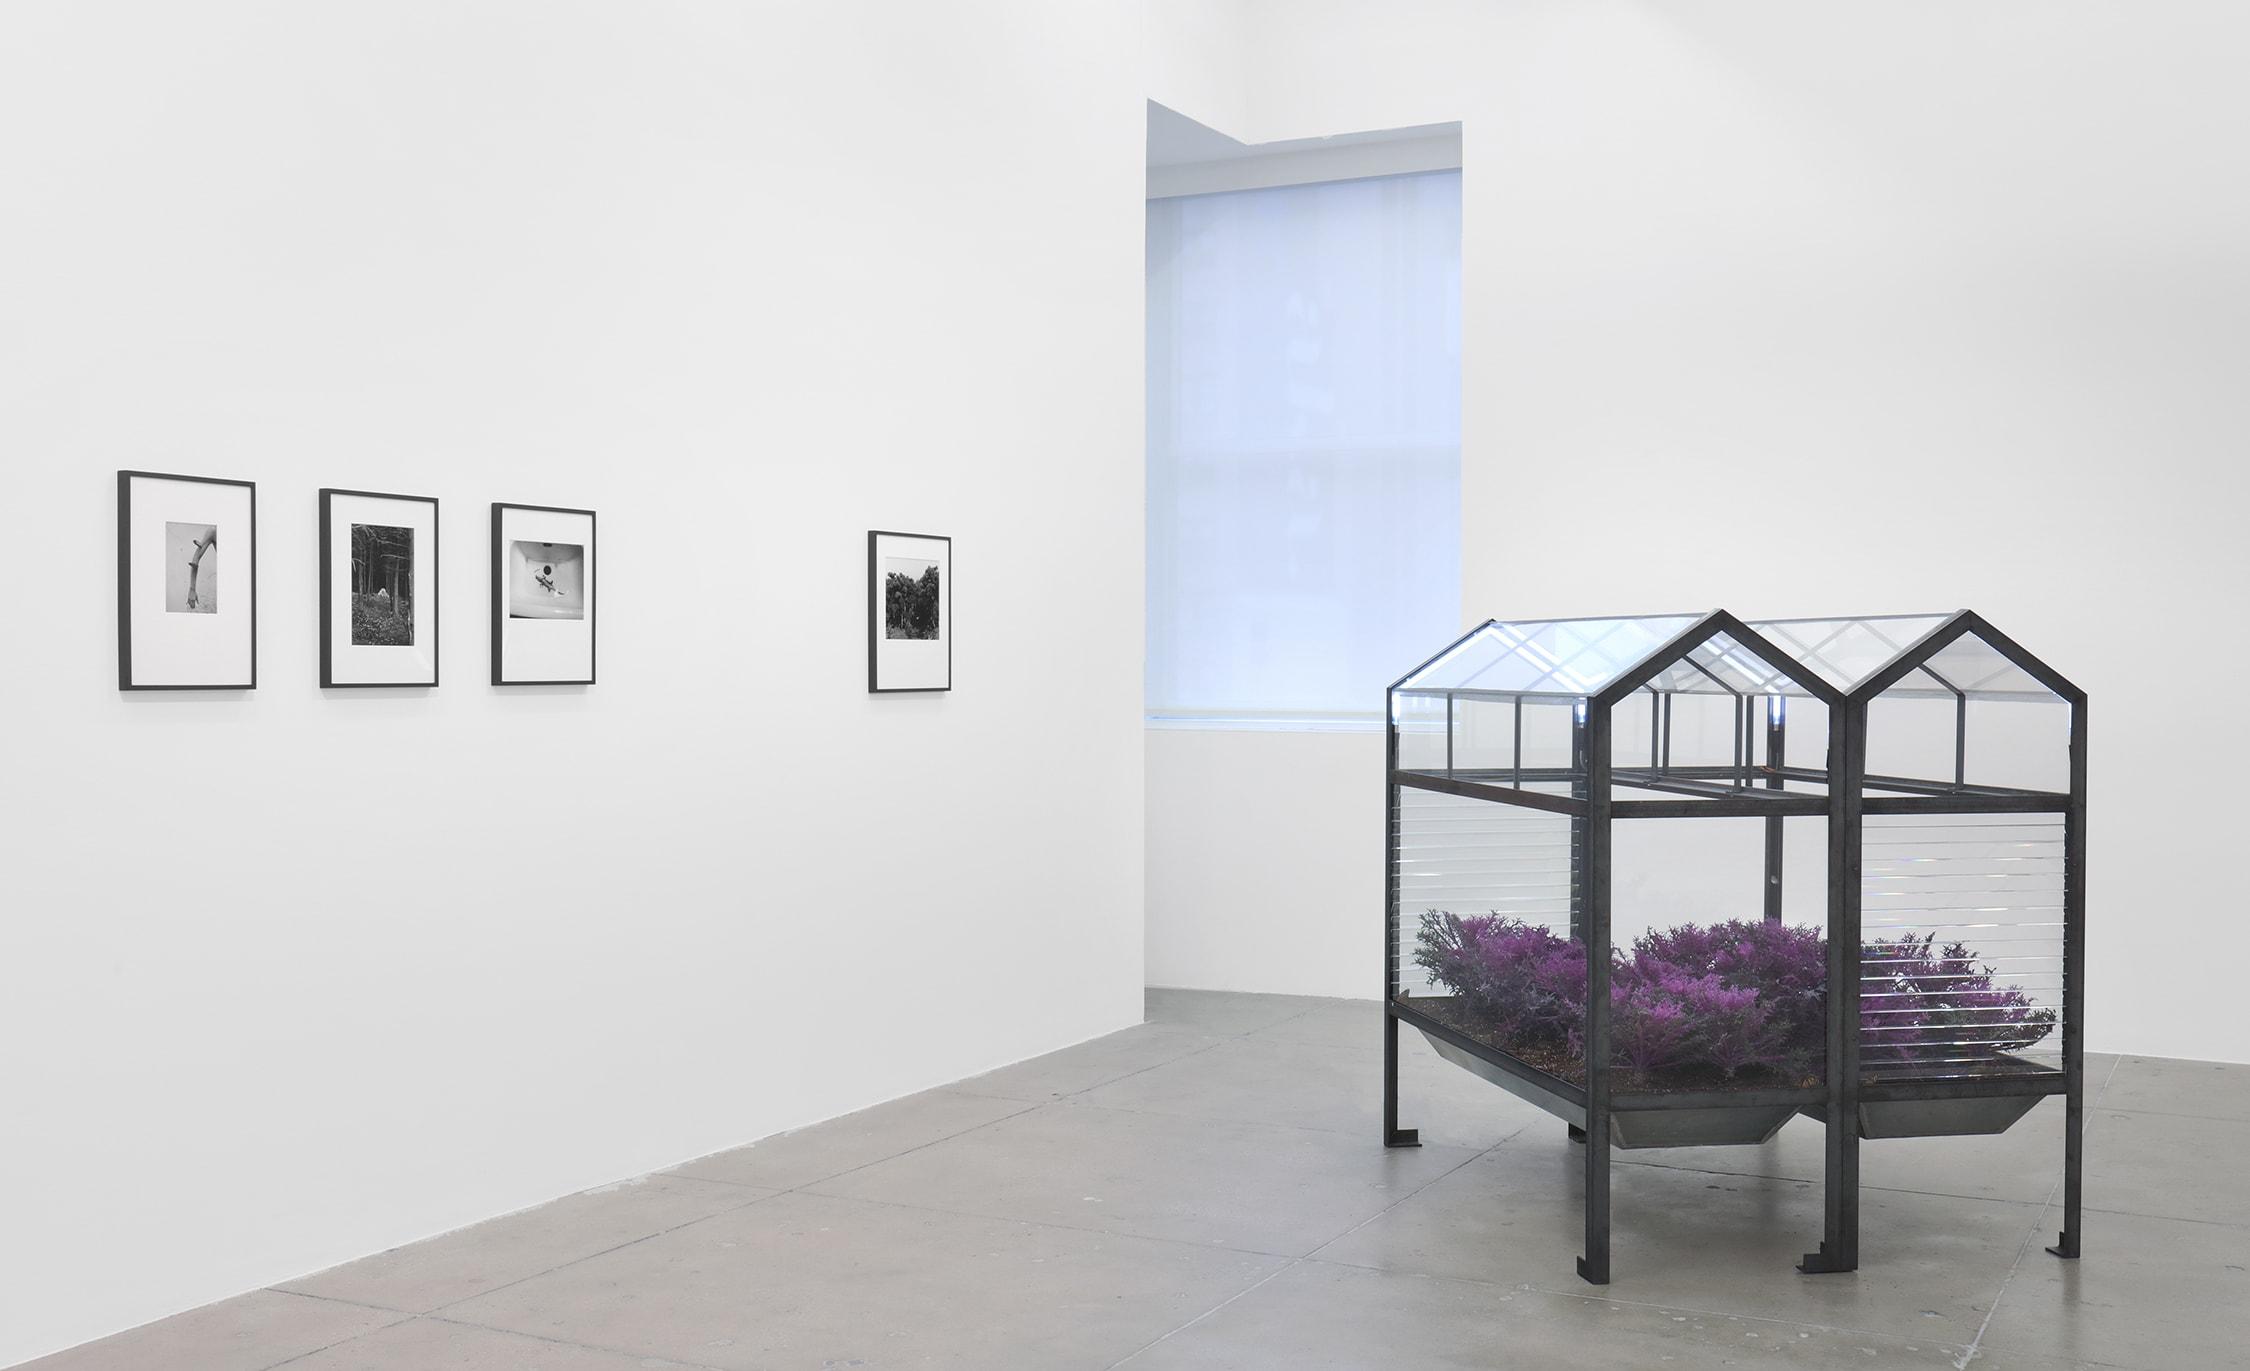 installation view of works by Lothar Baumgarten